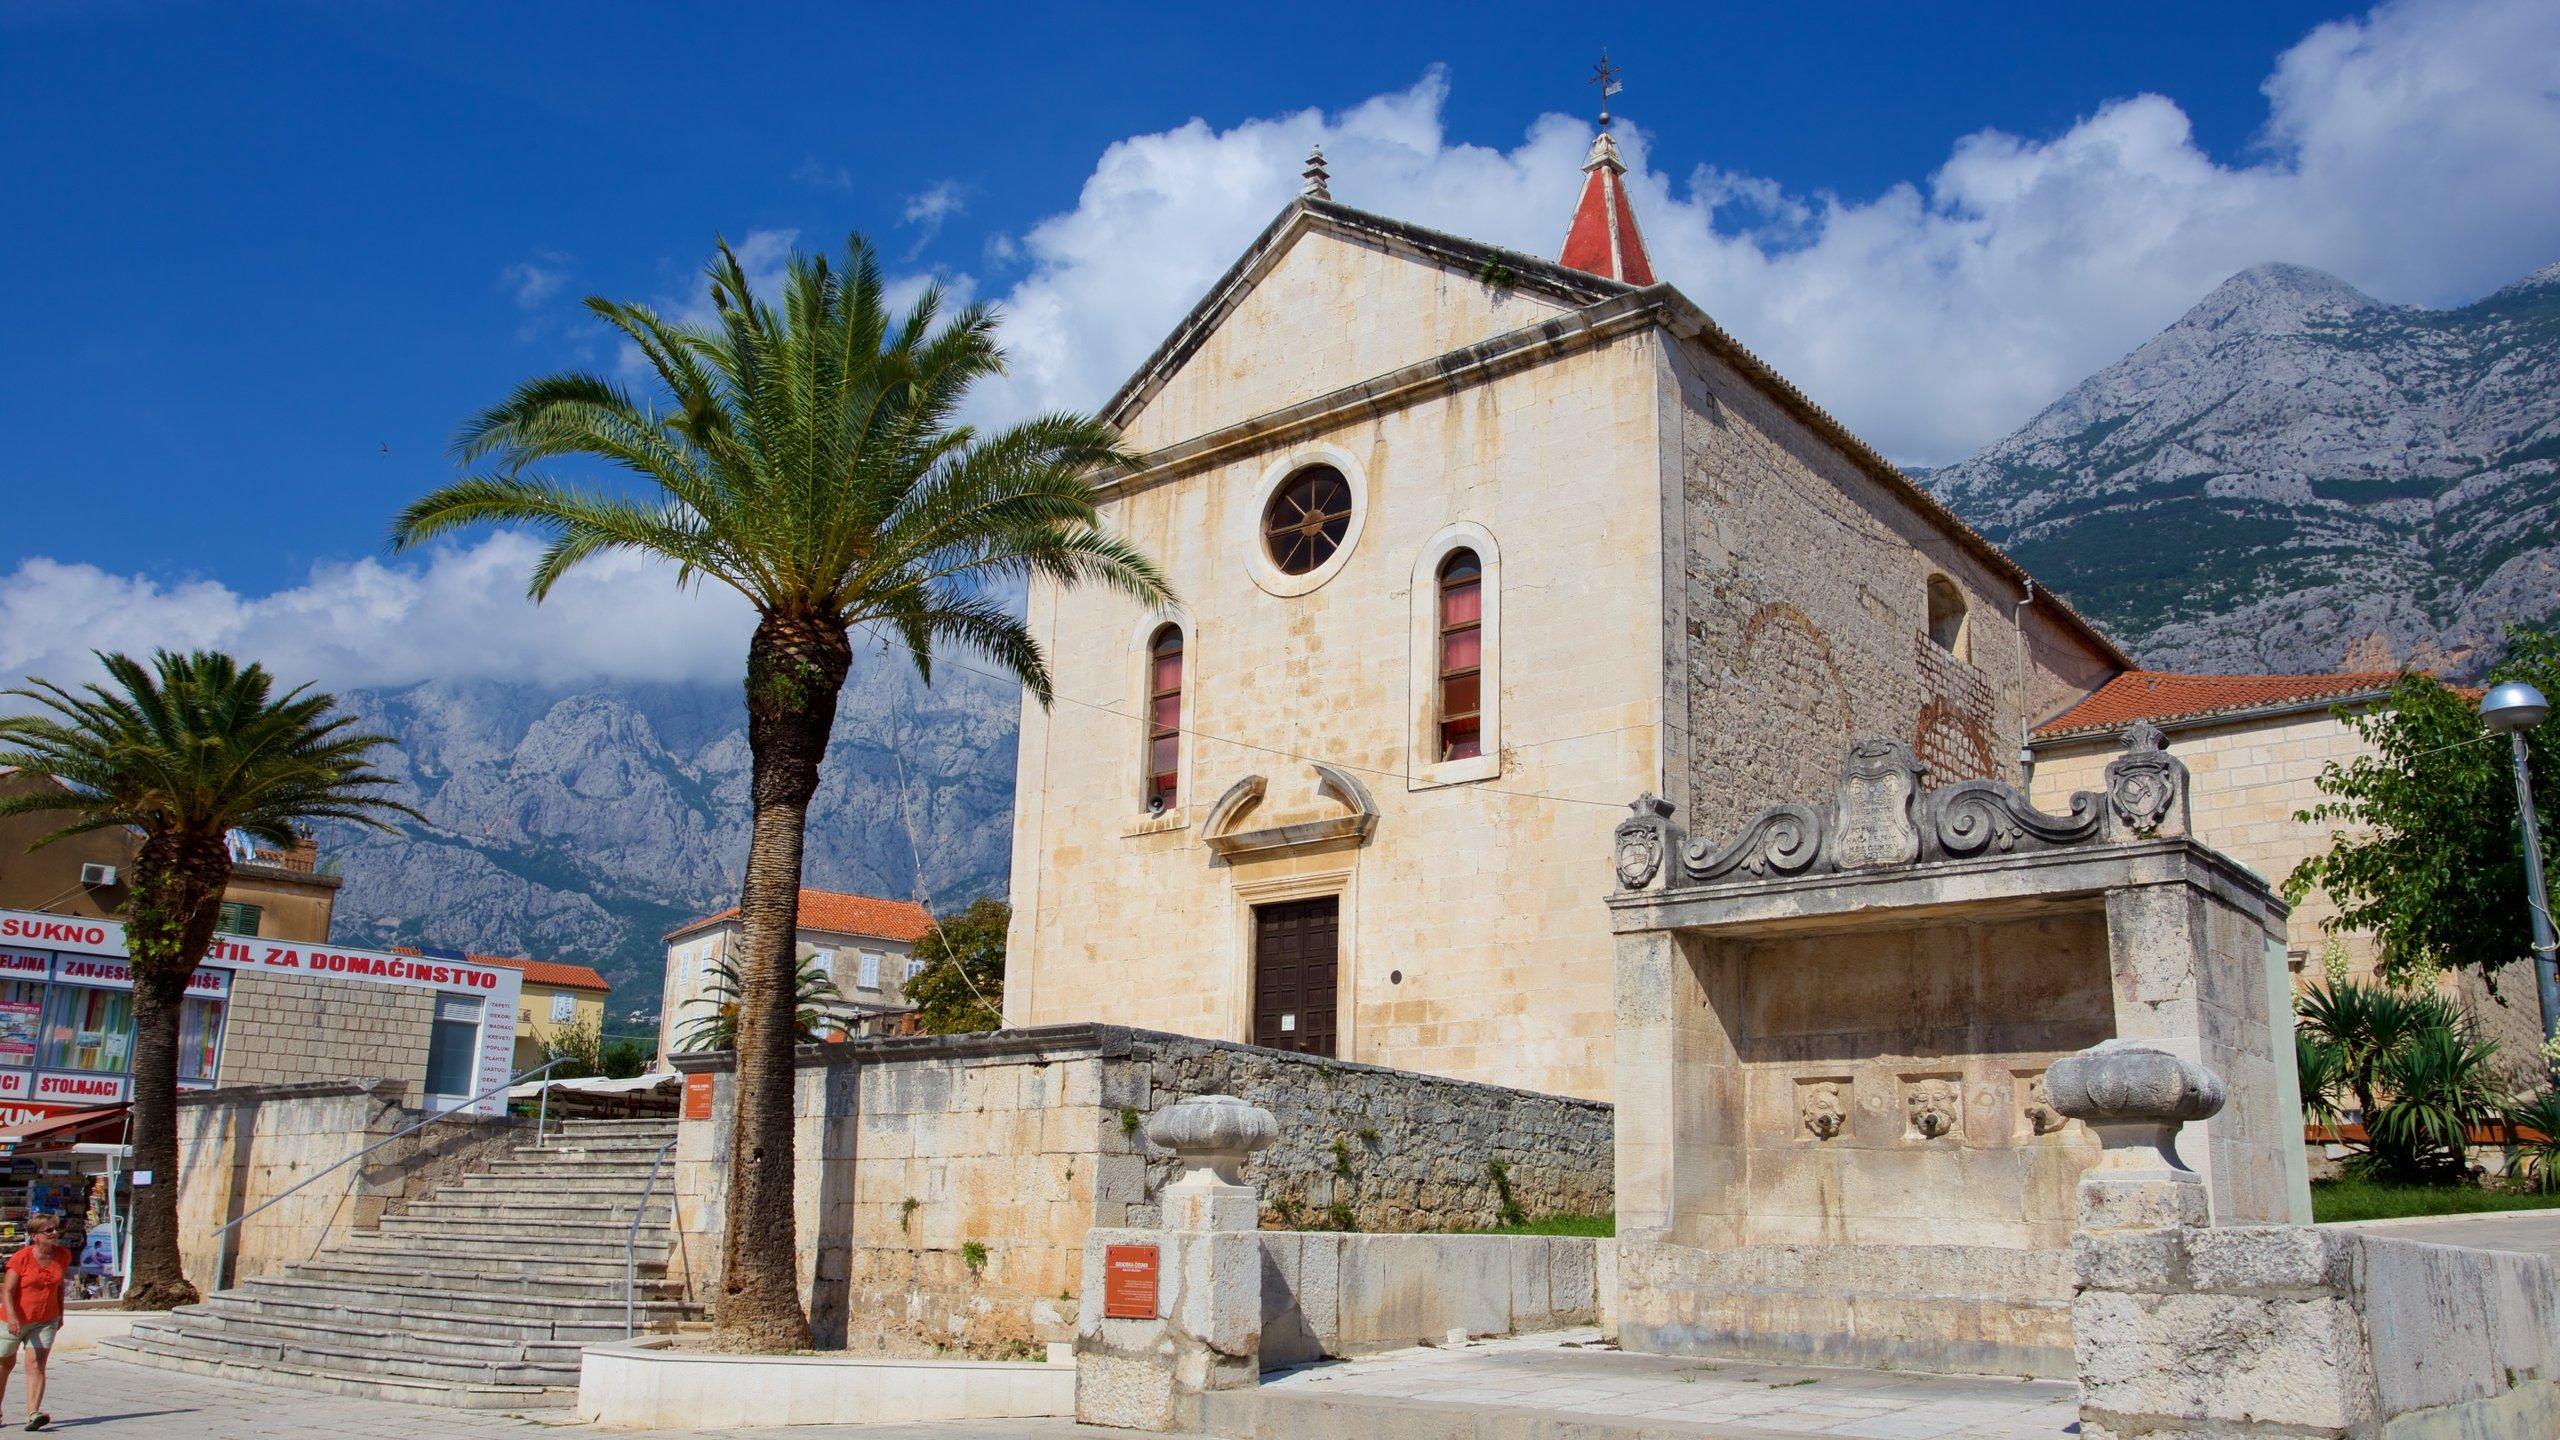 Altstadt von Makarska, Makarska, Split-Dalmatien, Kroatien